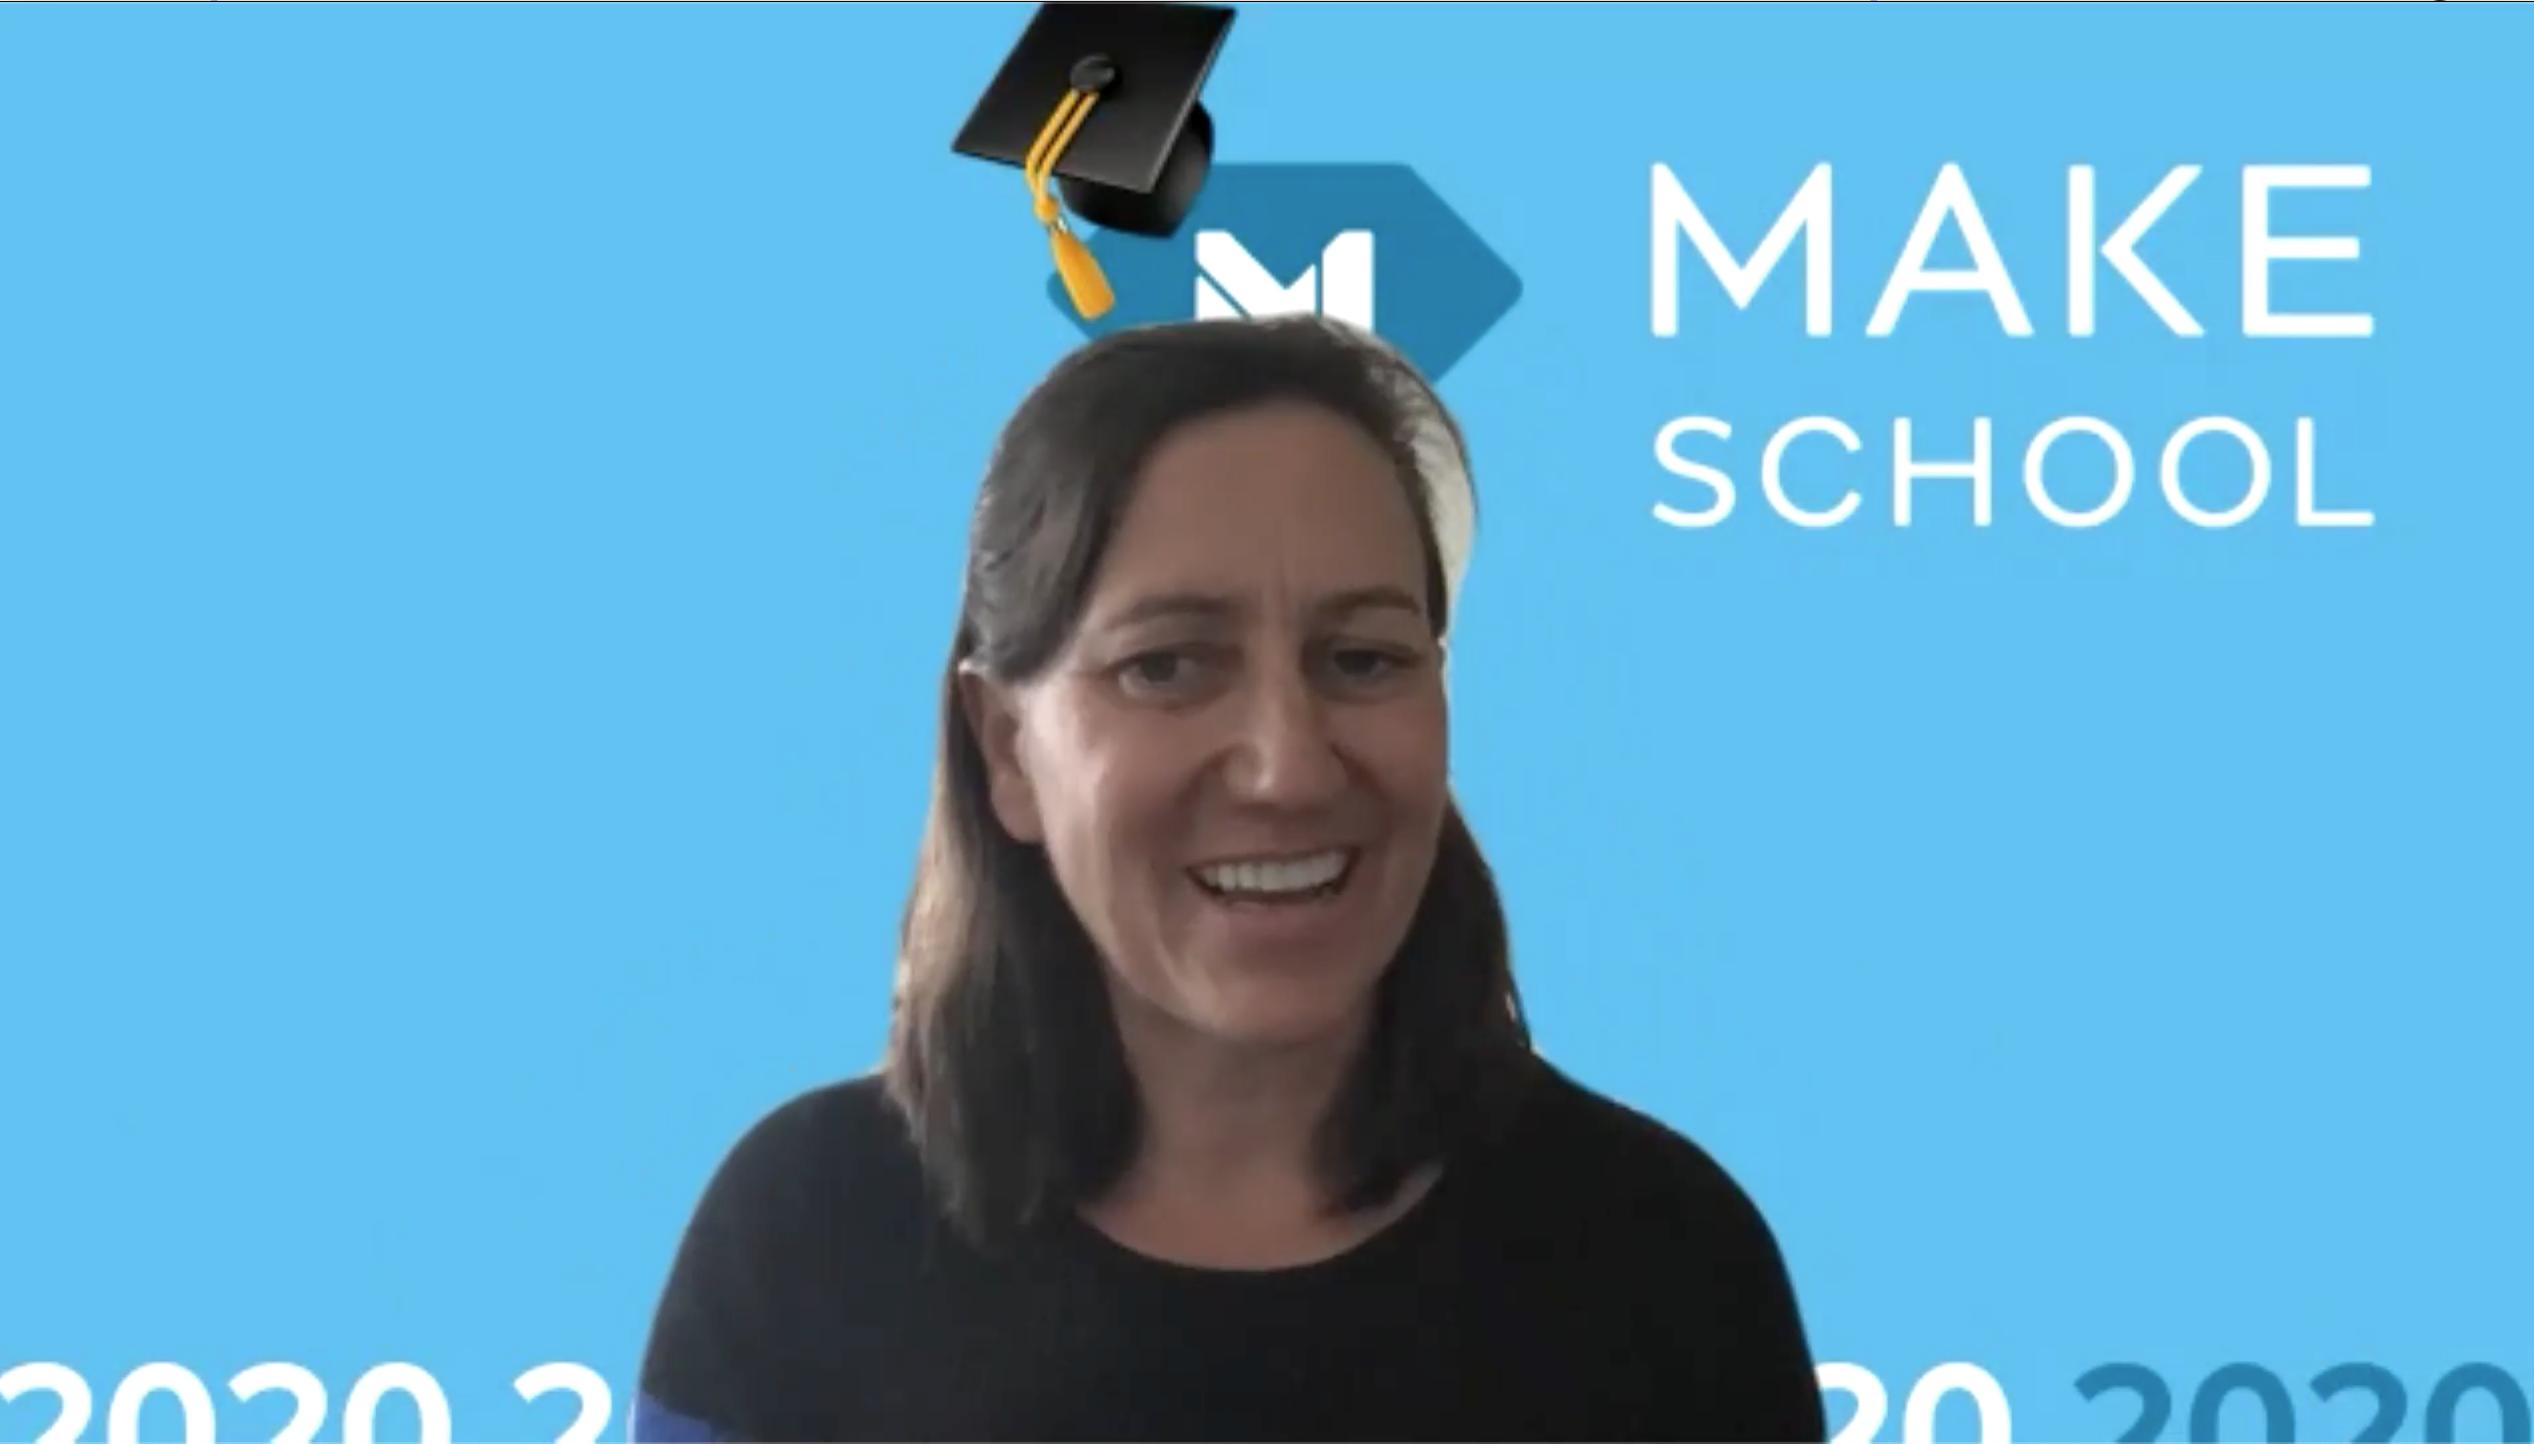 Dean of Make School, Dr. Anne Spalding